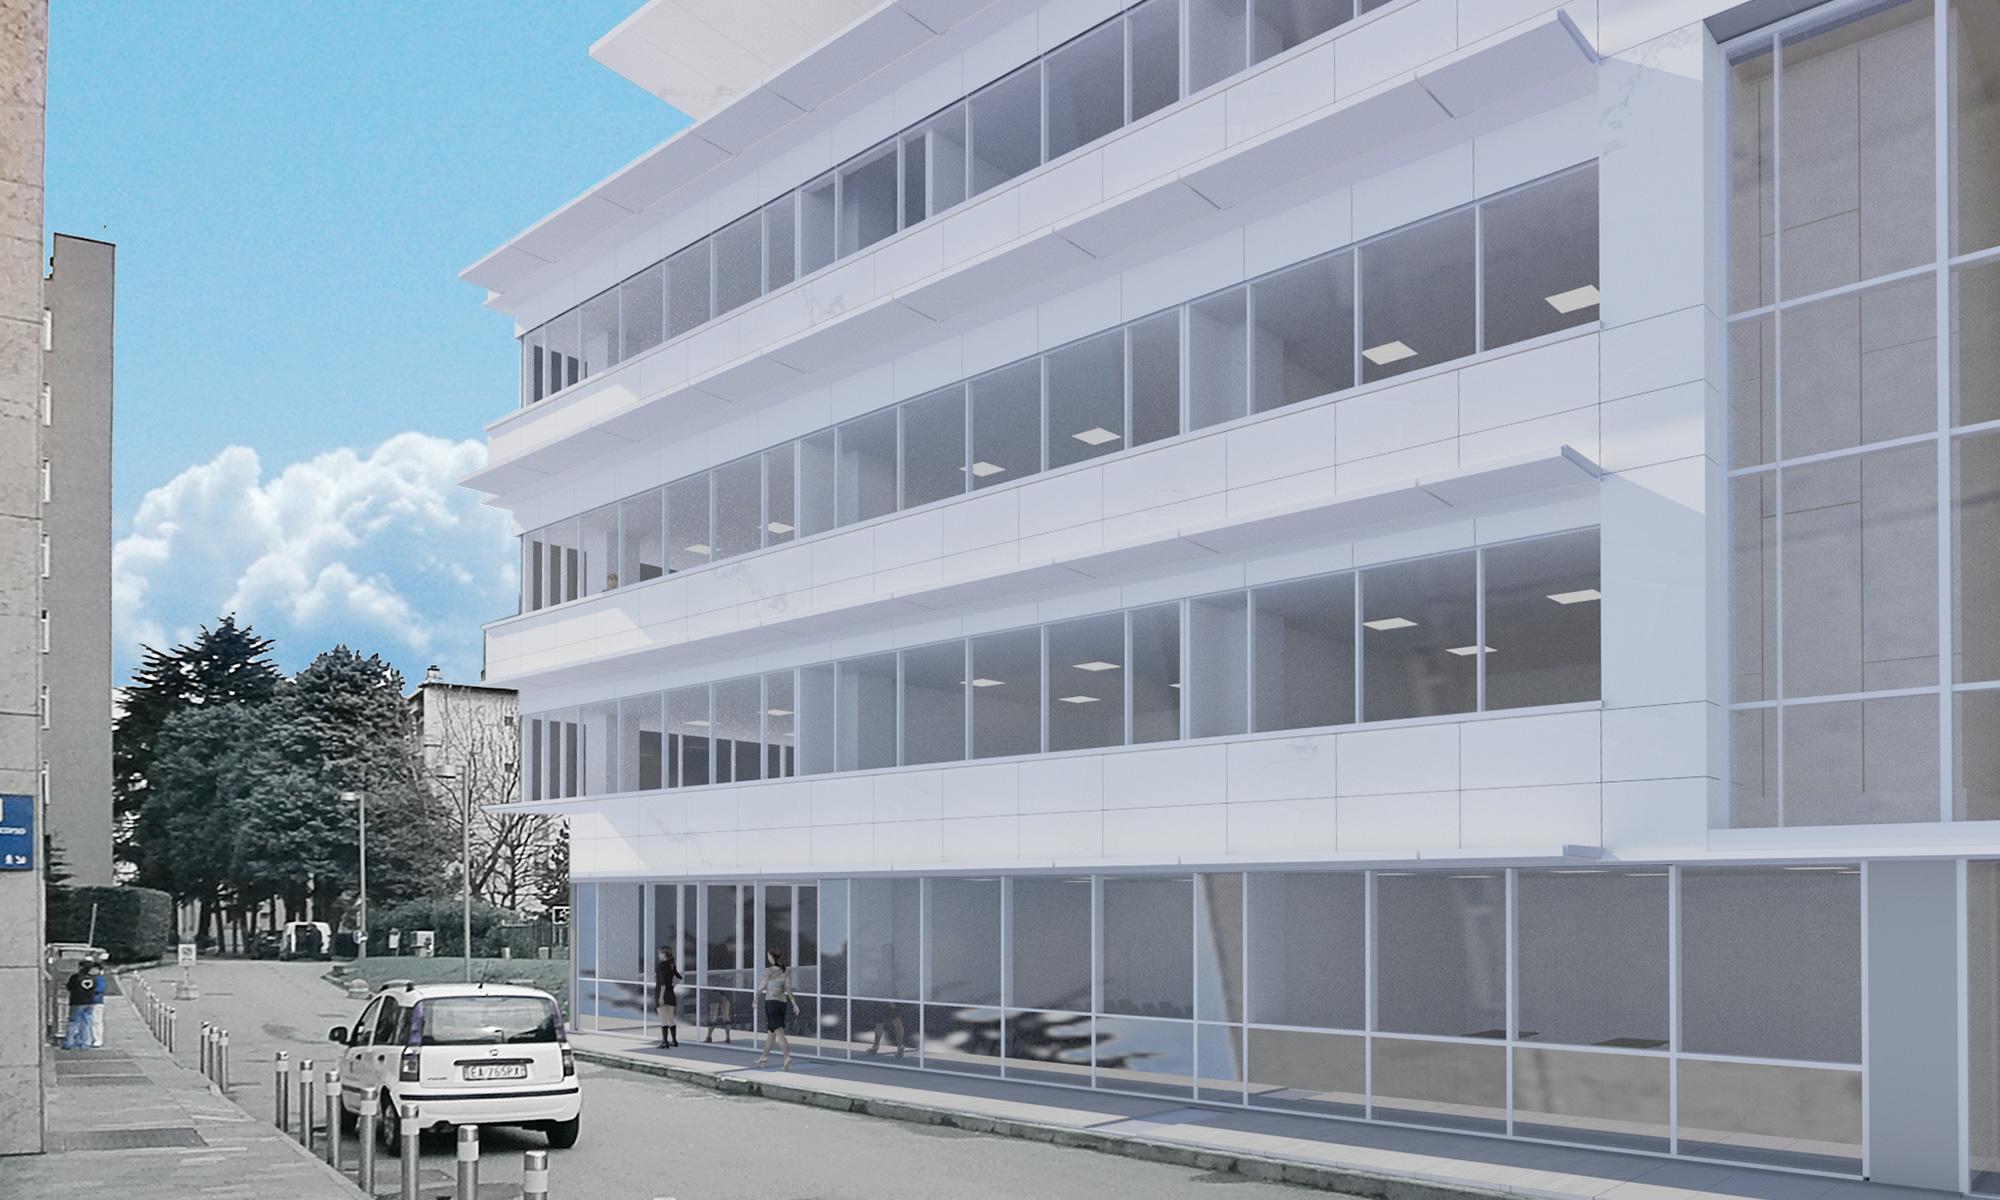 Ingegnere Raffaele Ramolini, Binini Partners , Società di architettura e ingegneria, Reggio Emilia, Italia